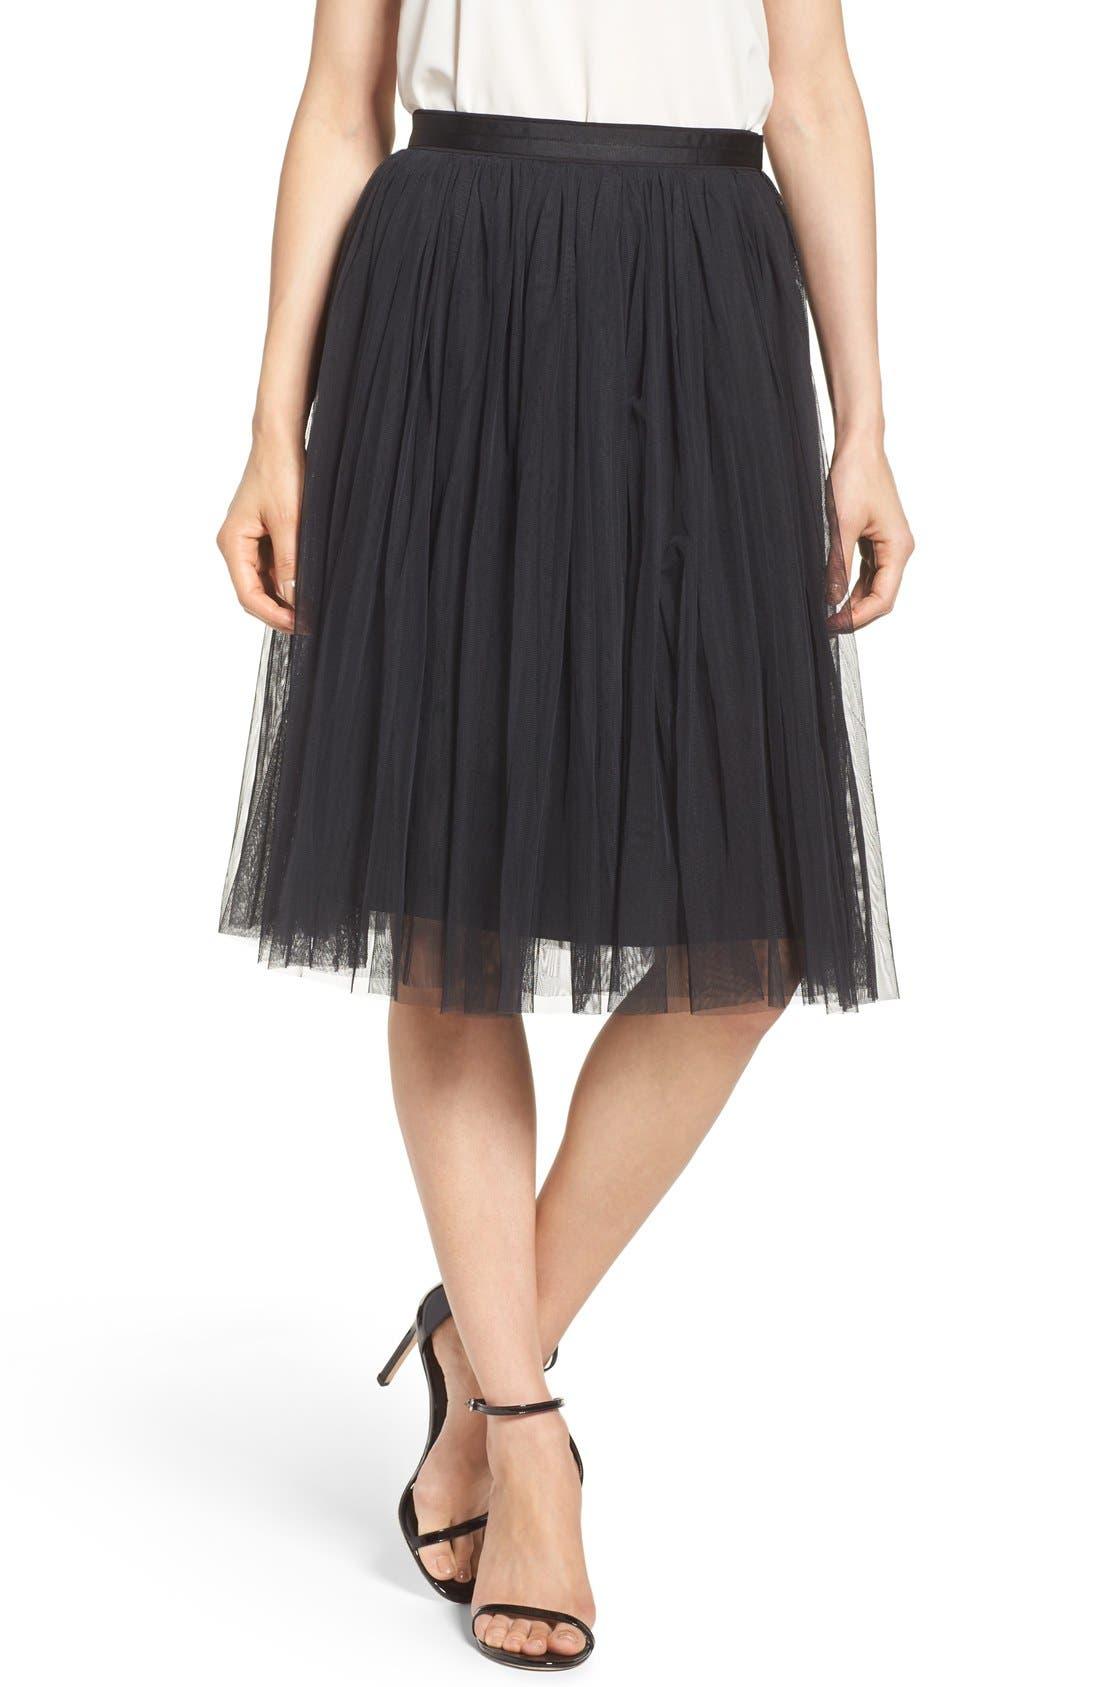 Alternate Image 1 Selected - Needle & Thread Tulle Skirt